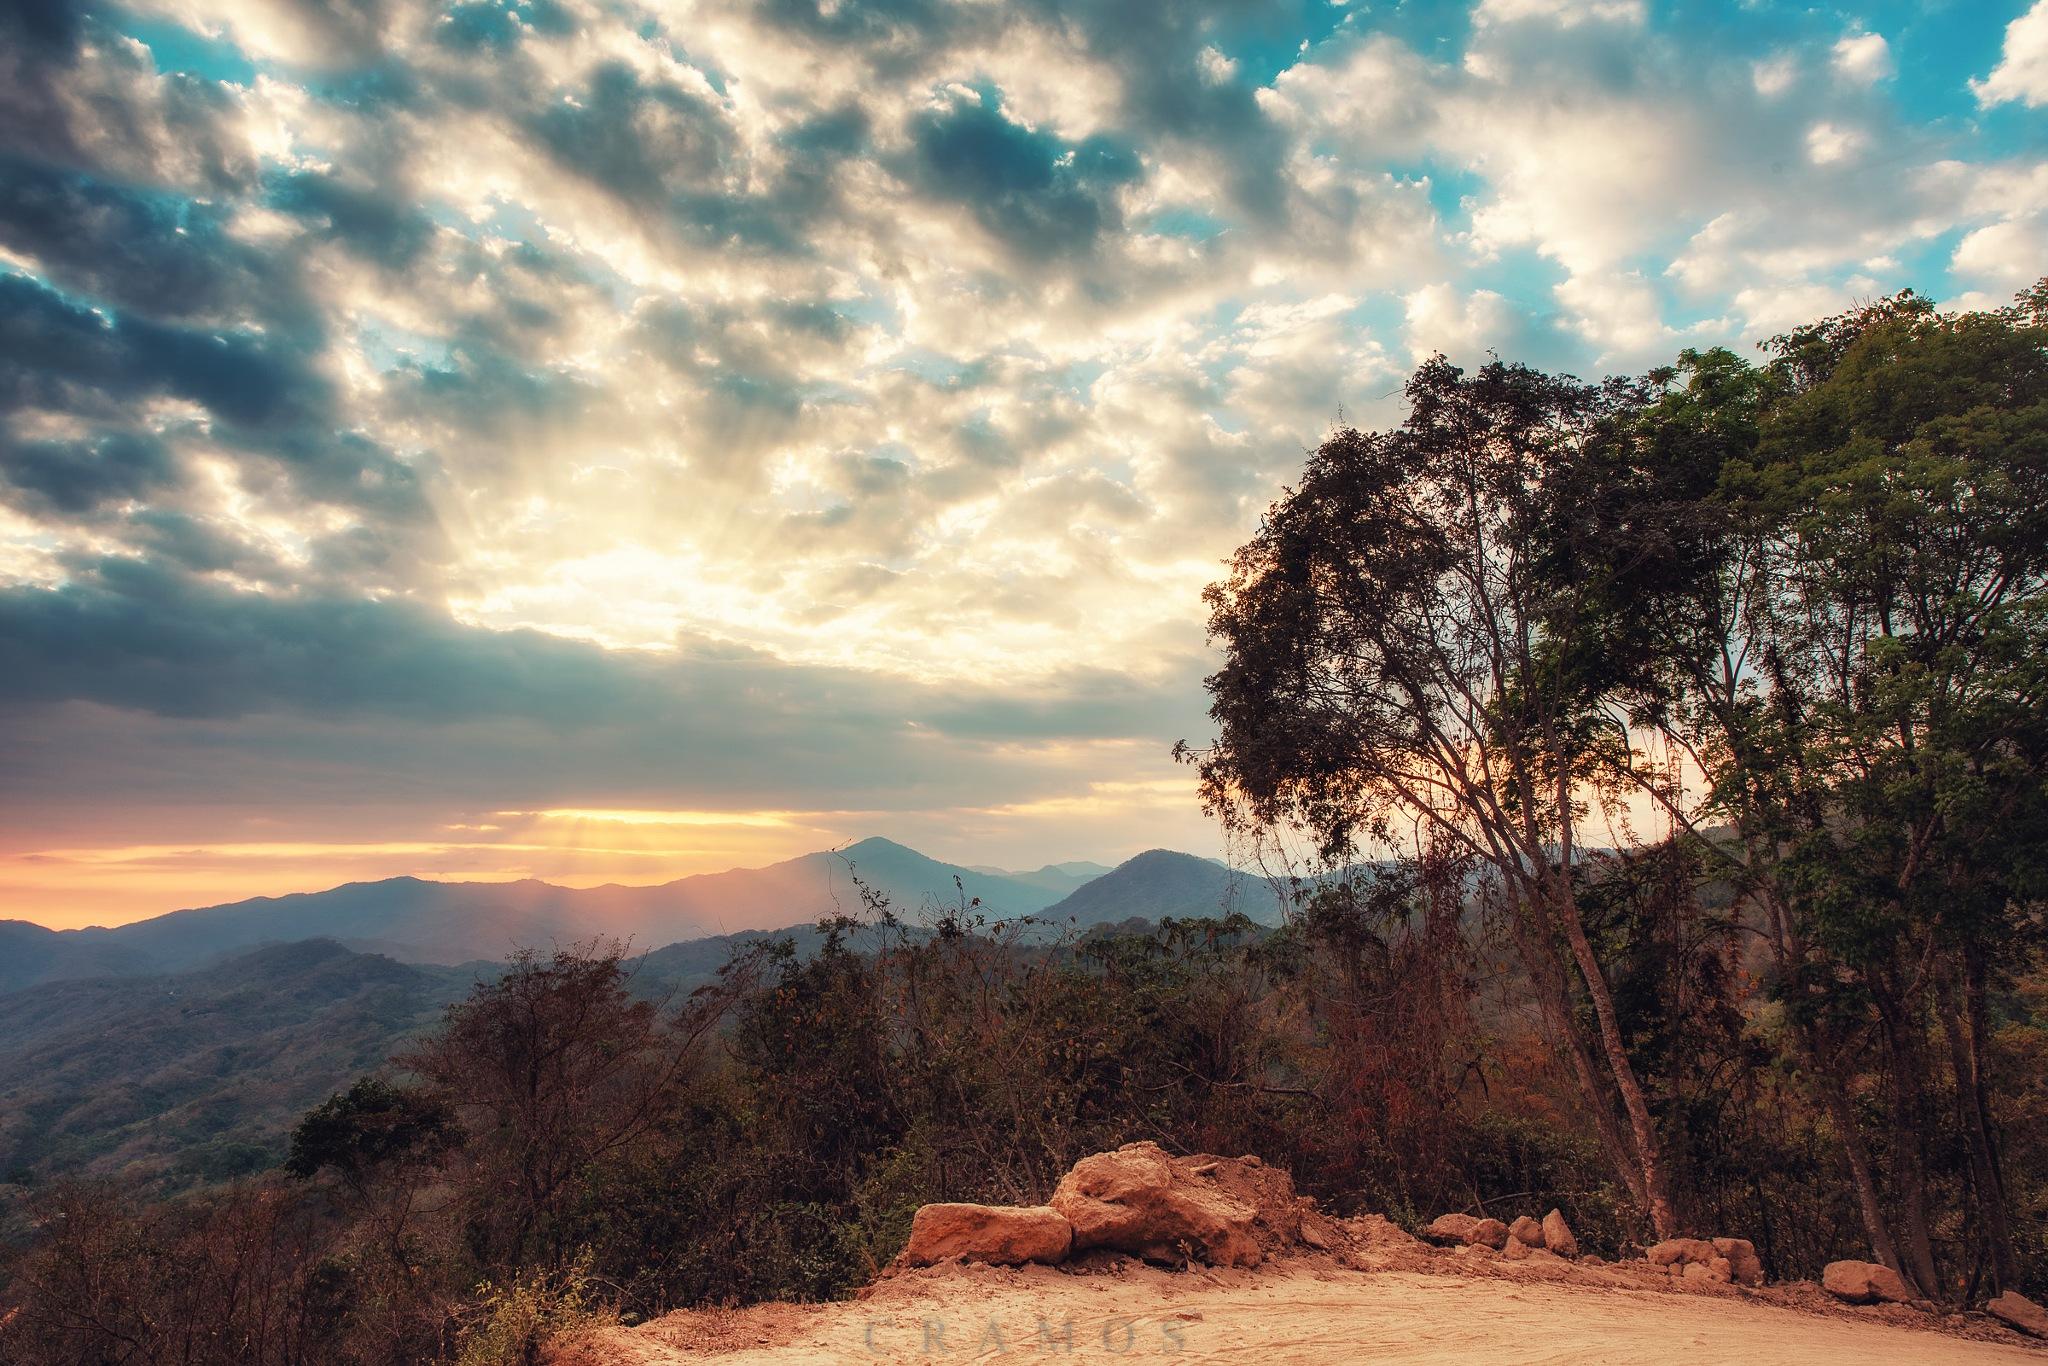 Copalitilla Sunset by César Ramos